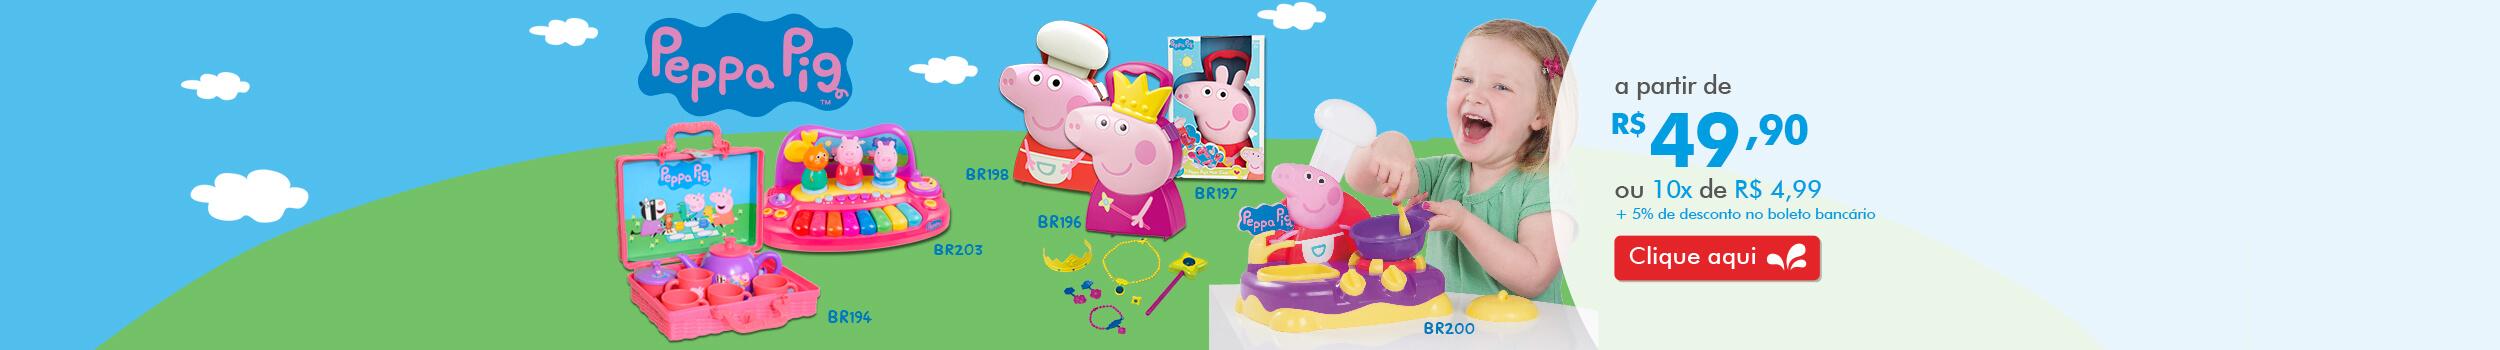 Banner Peppa Pig